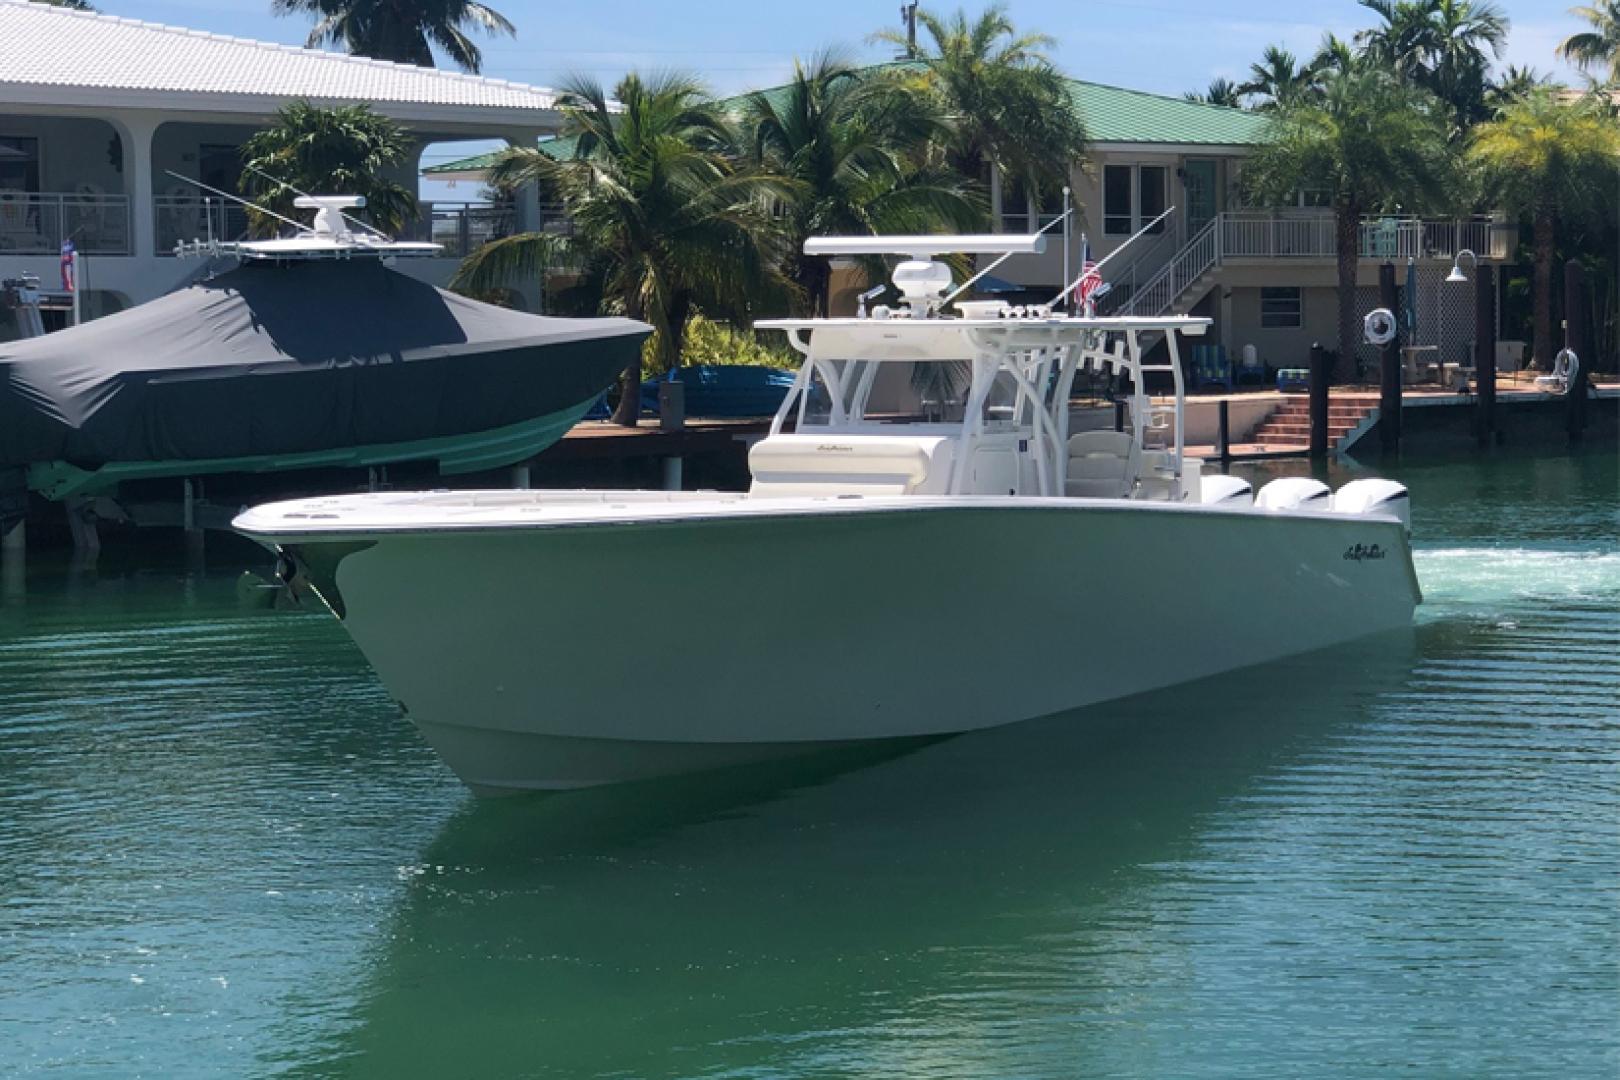 SeaHunter-45 Center Console 2016-No Name Bal Harbour-Florida-United States-2016 Sea Hunter 45 Center Console  Profile-1469671   Thumbnail